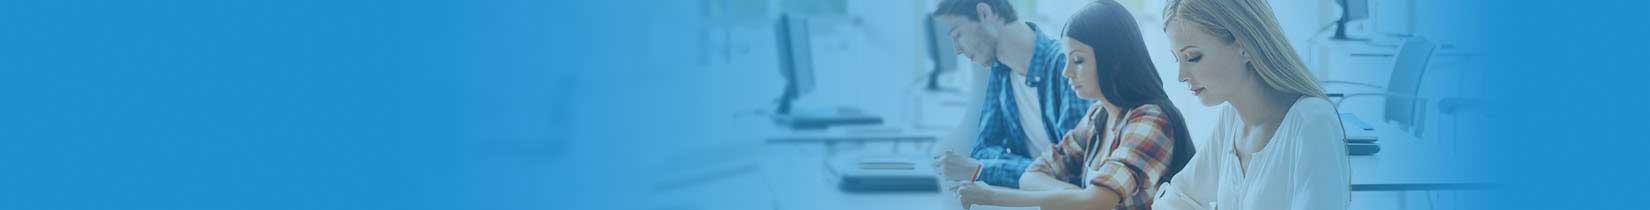 Free Online <br> IELTS Test